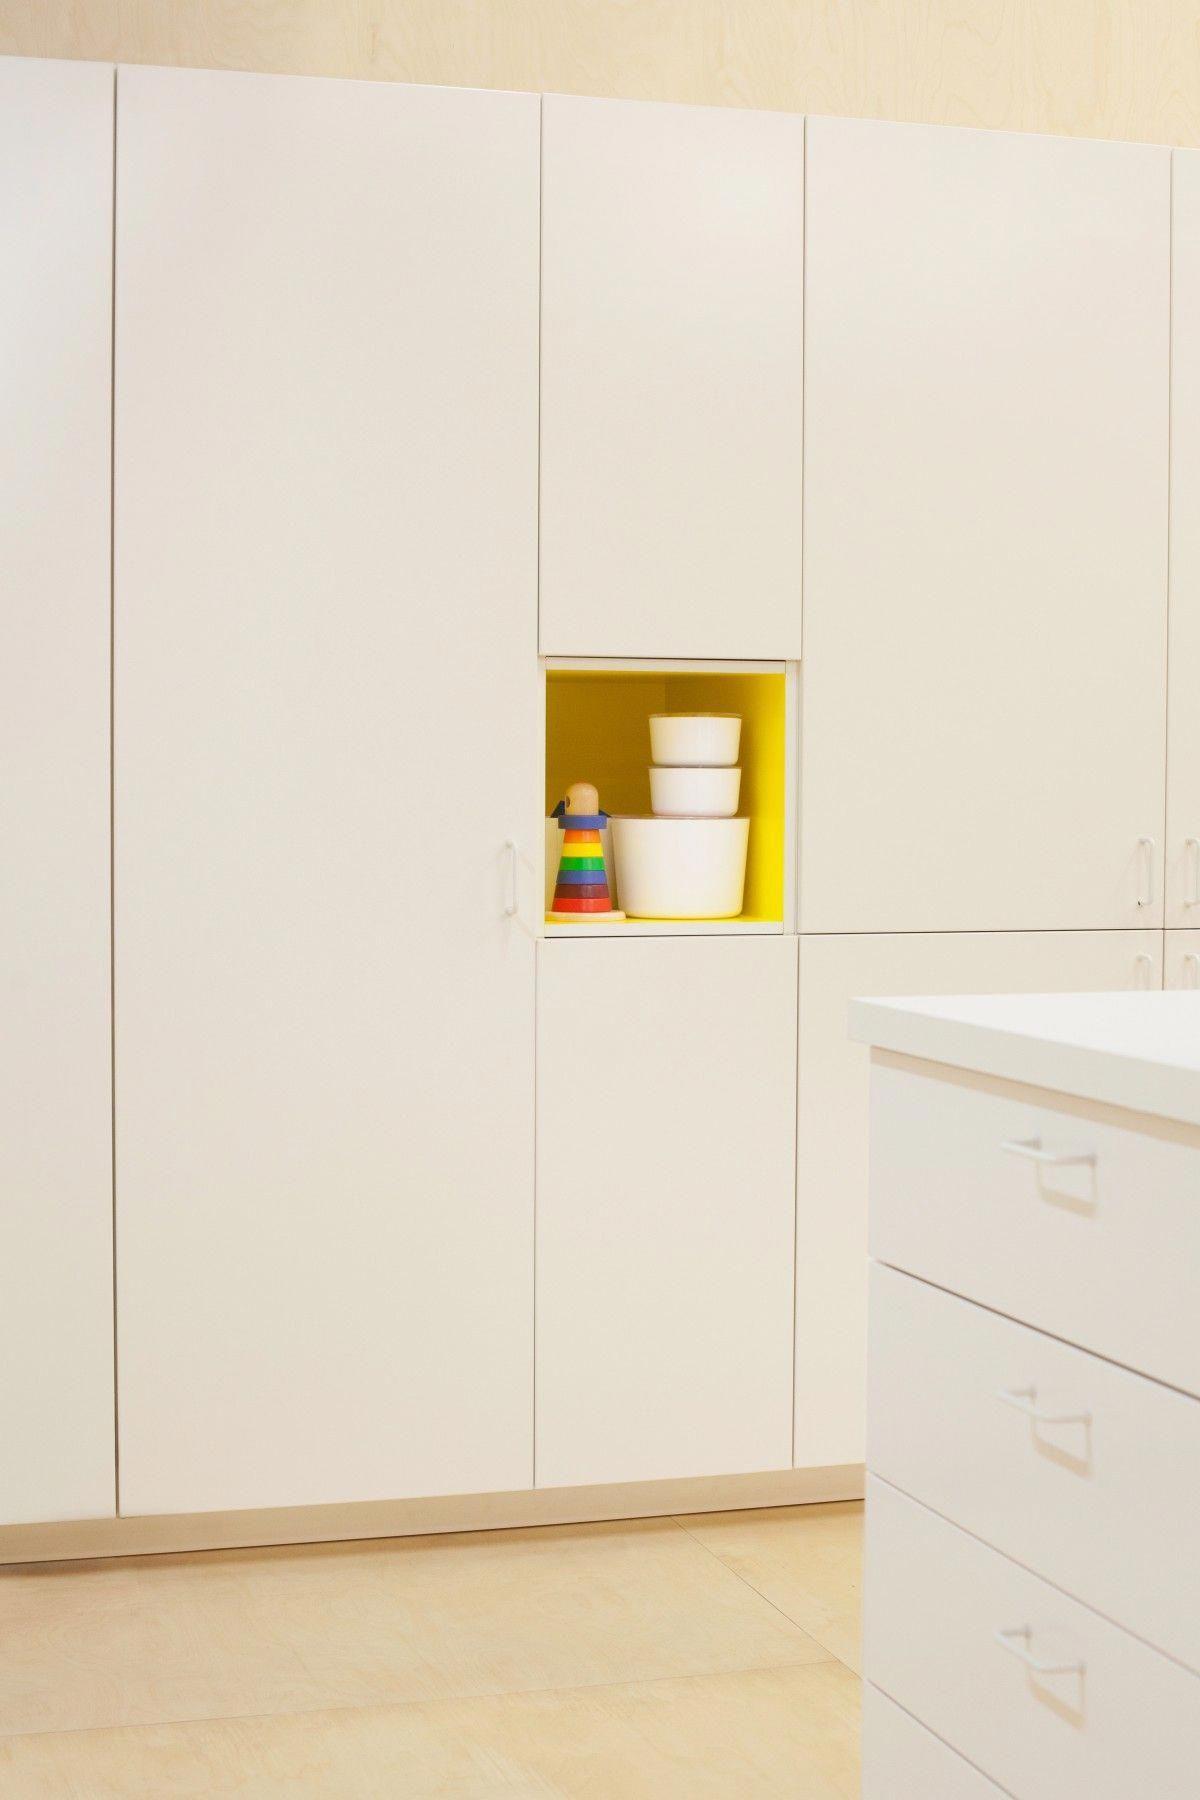 Cheap Home Decor Accessories Gifts Saleprice 50 Ikea Kuchenideen Kuchen Inspiration Haus Kuchen